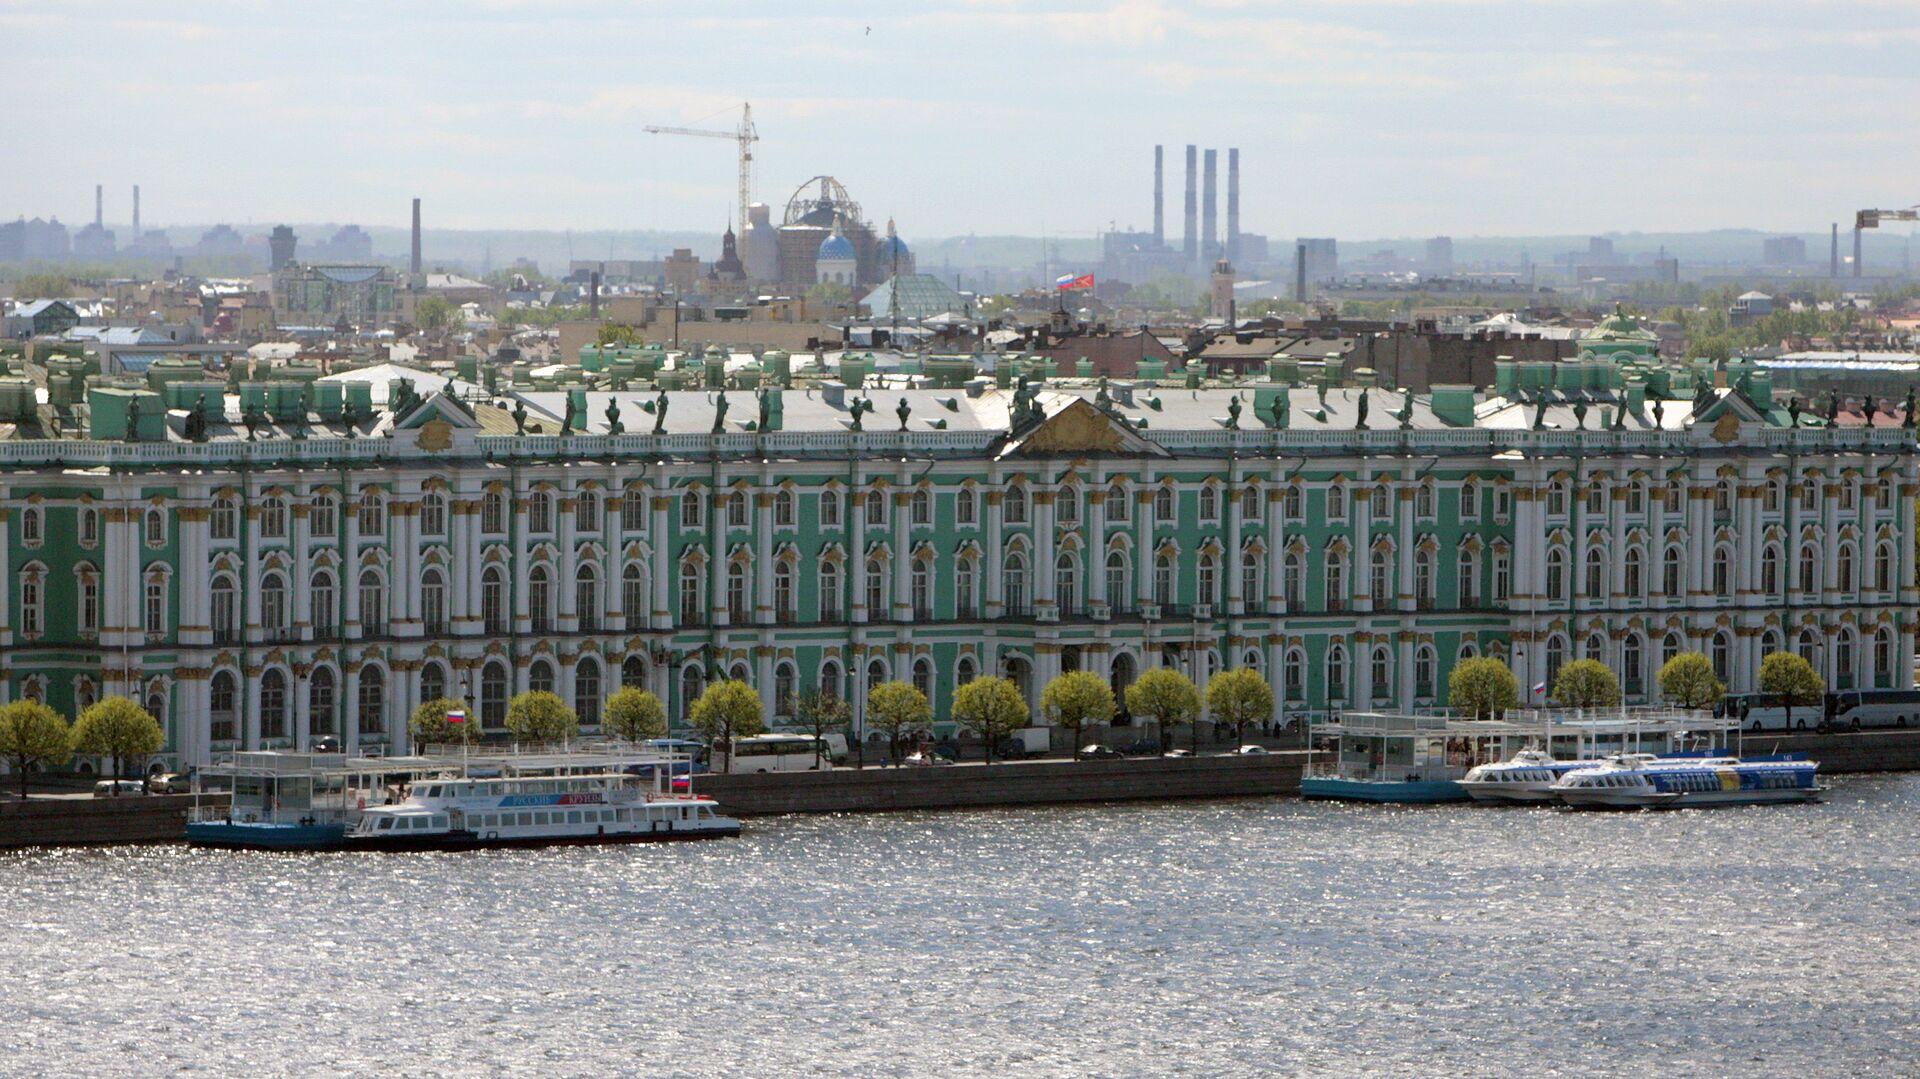 Museo Hermitage en San Petersburgo - Sputnik Mundo, 1920, 01.09.2021